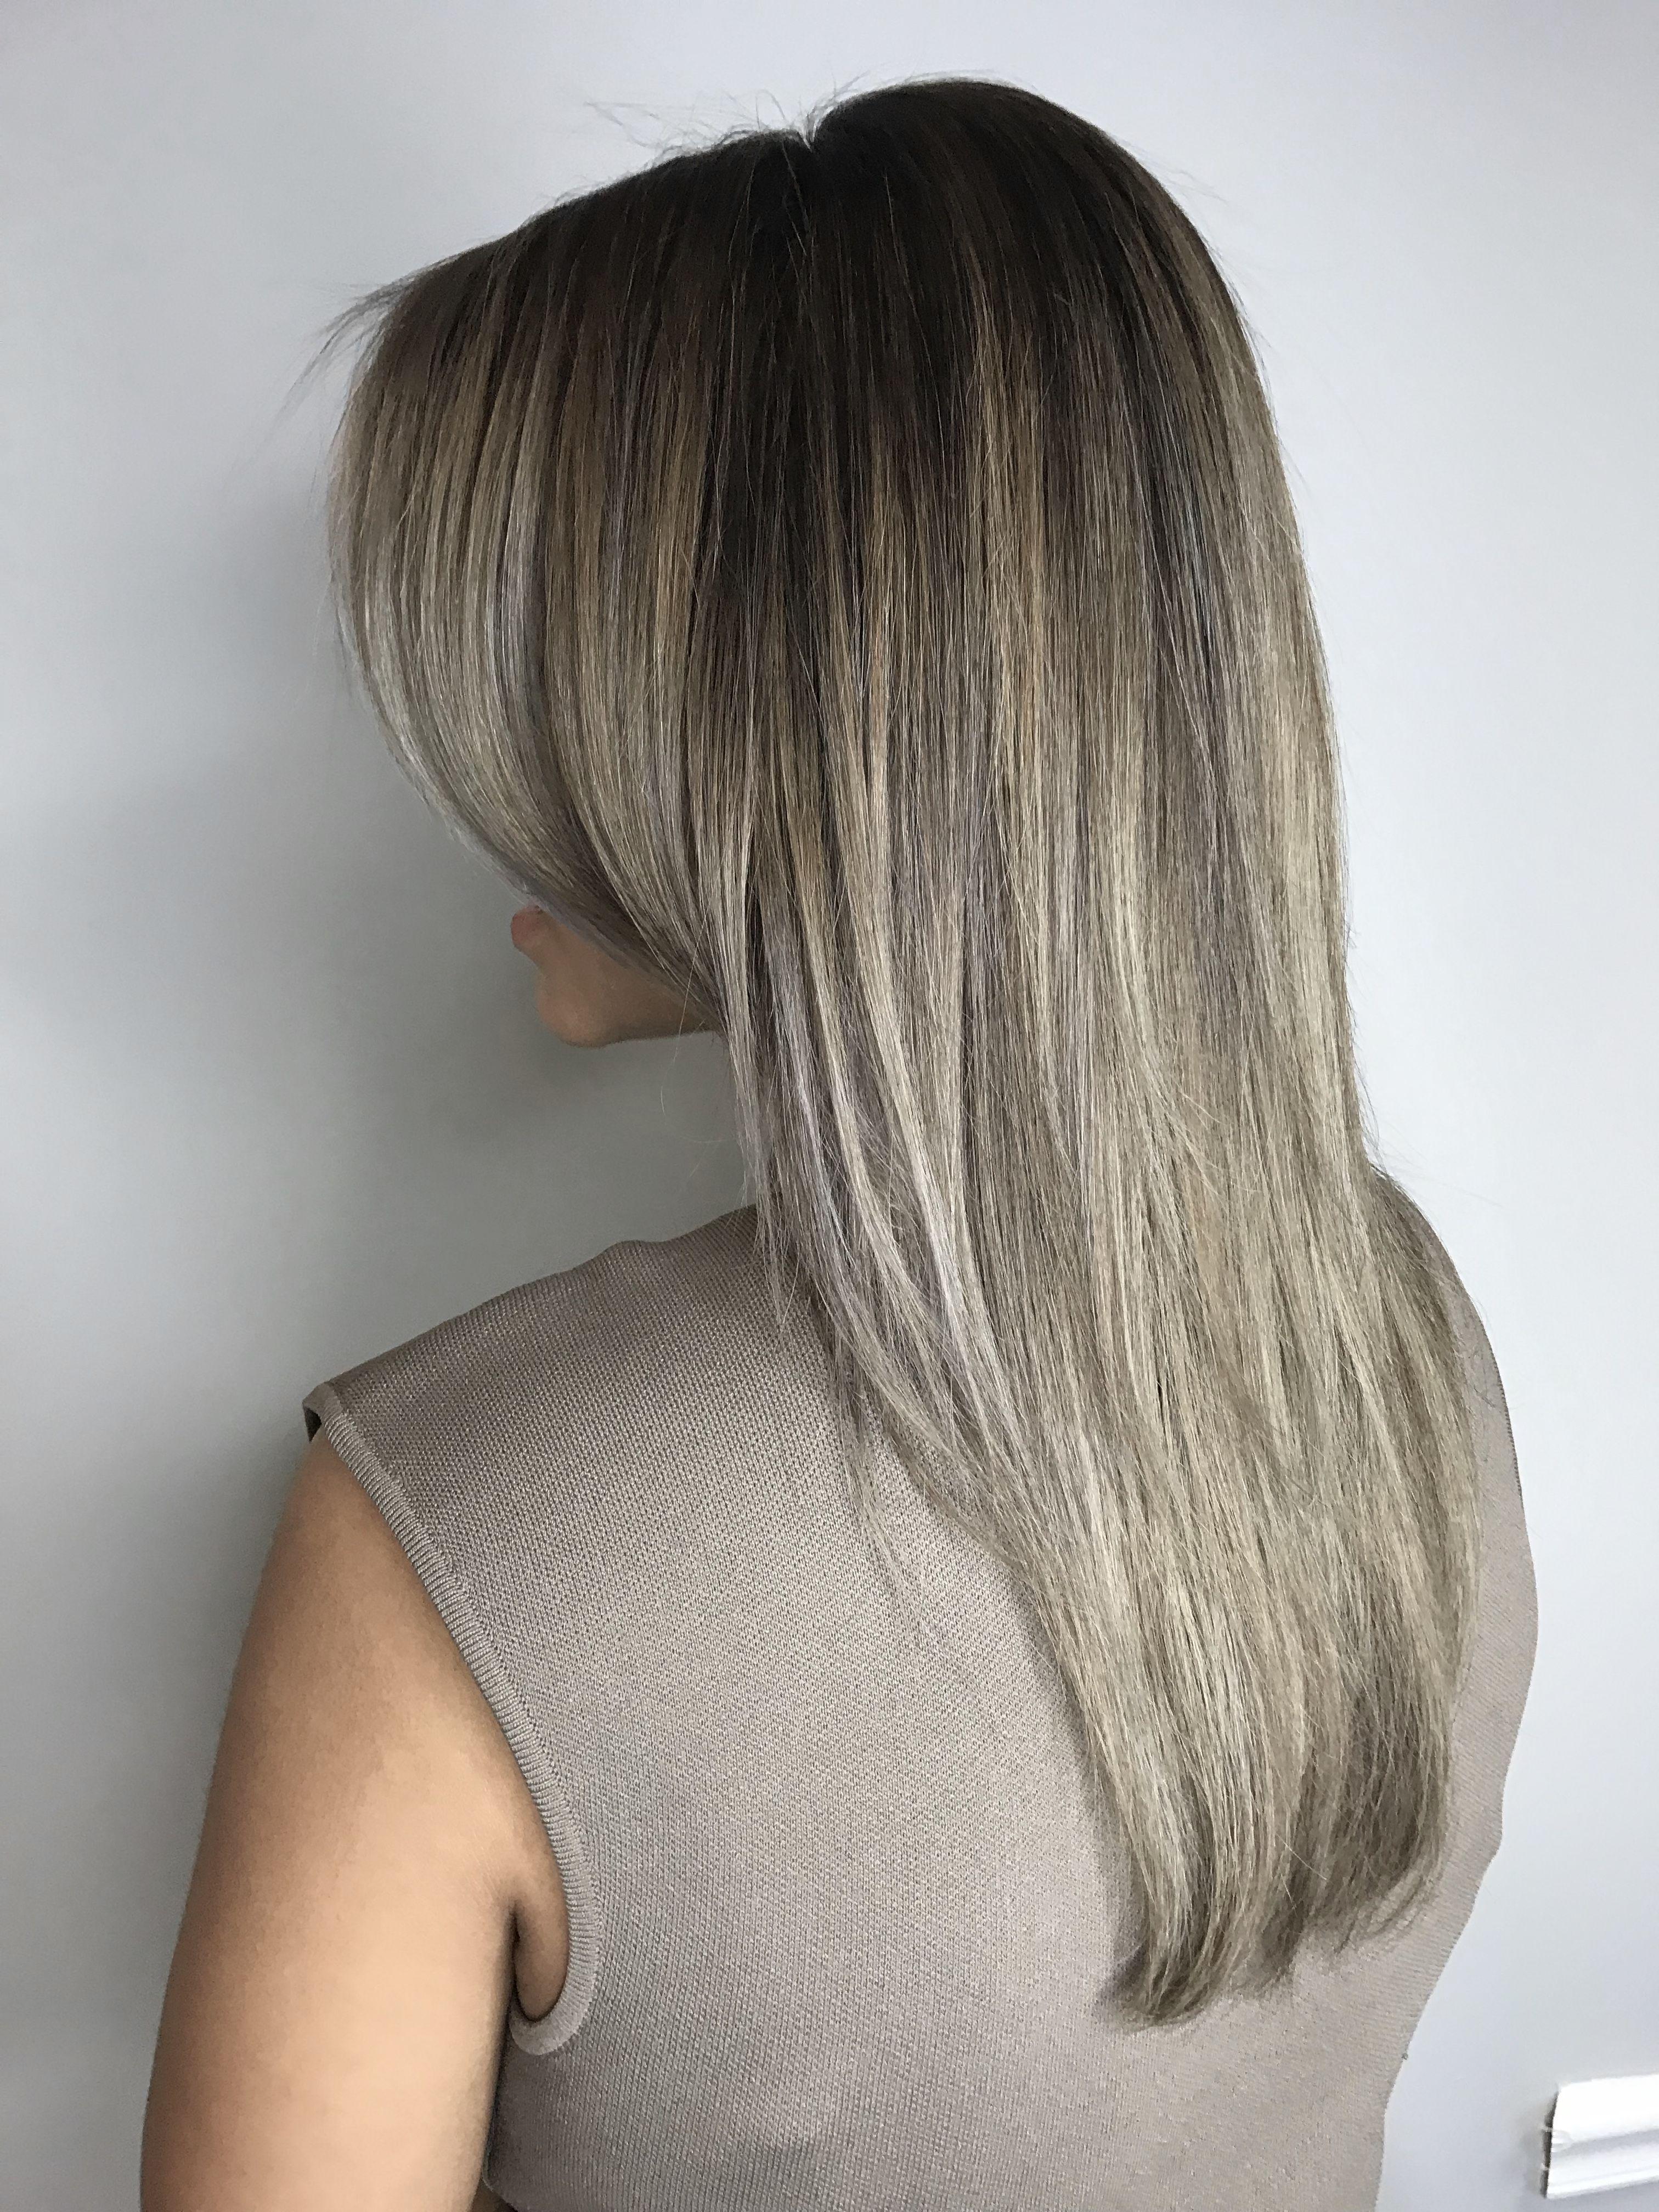 Home Ubu Color Salon In Tampa Fl Dark Hair With Highlights Balayage Hair